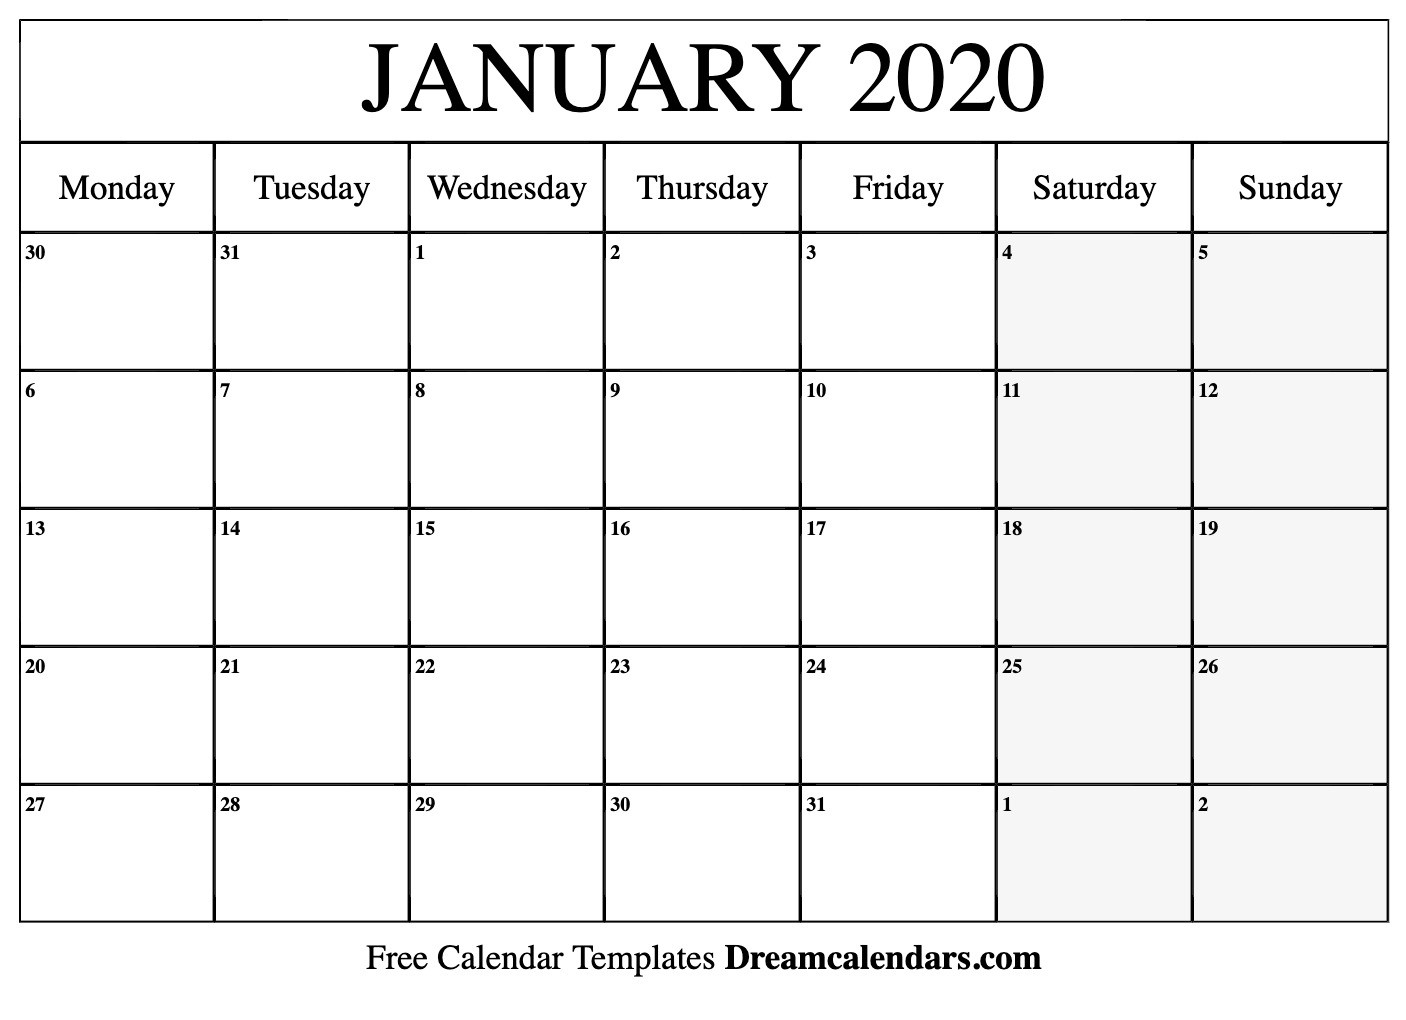 Printable January 2020 Calendar-January 2020 Calendar Free Printable